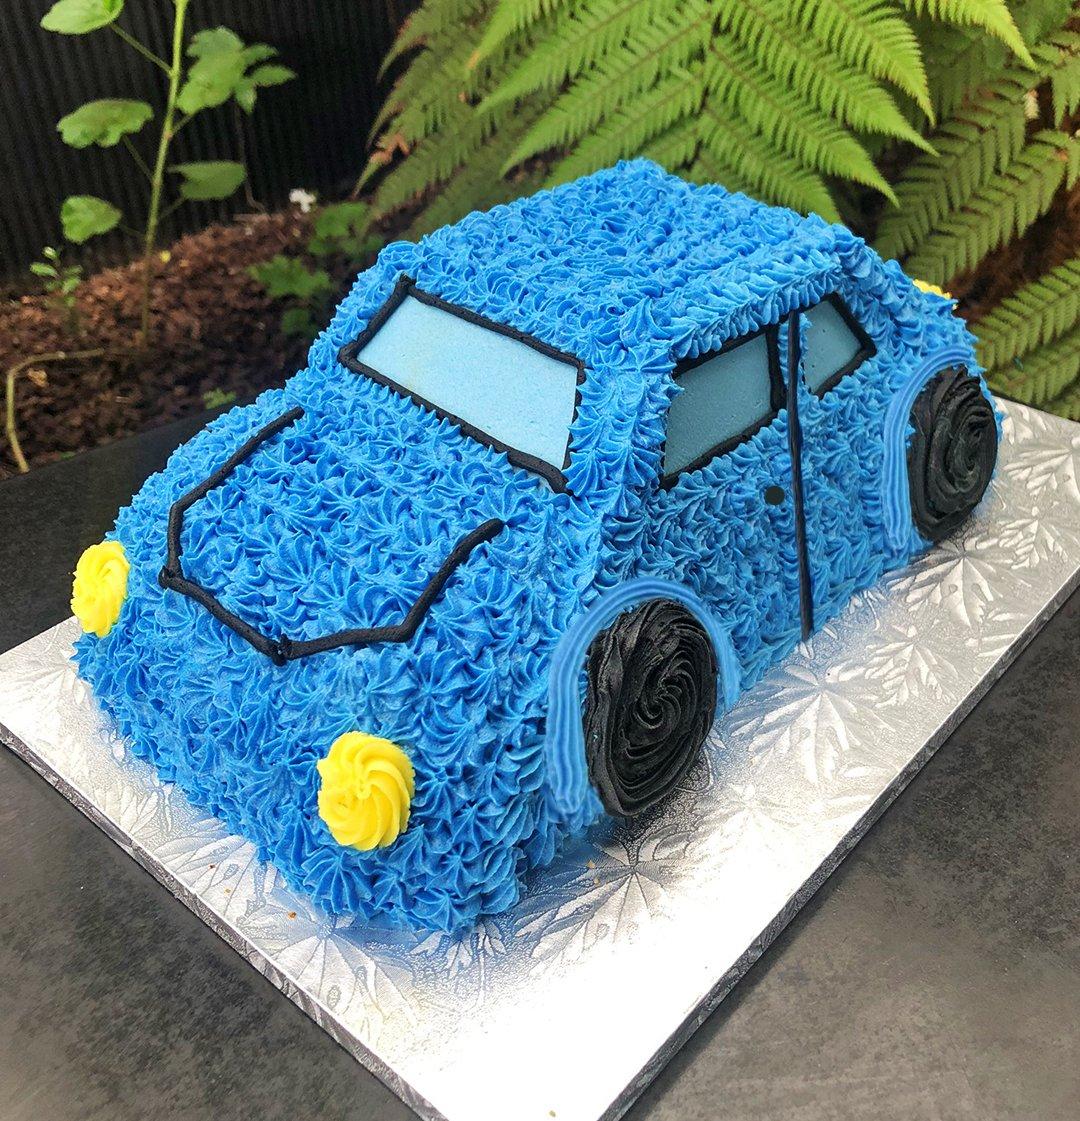 Awe Inspiring 3D Car In Blue Birthday Cake Kidds Cakes Bakery Personalised Birthday Cards Sponlily Jamesorg